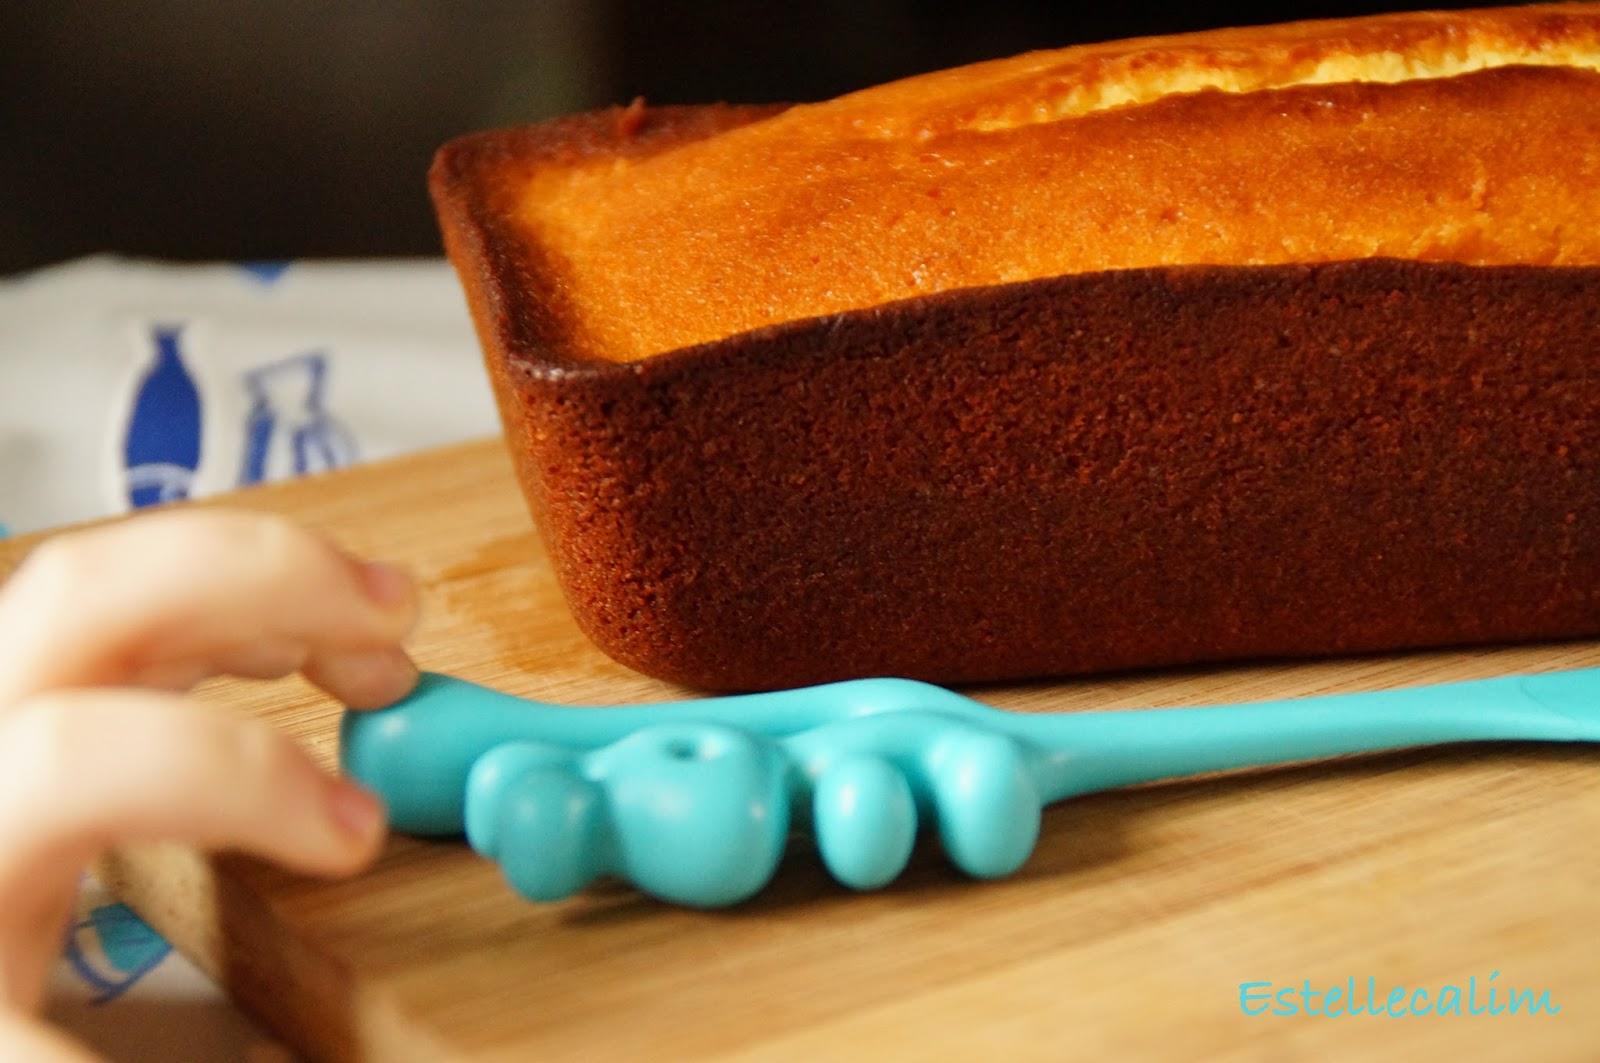 Cake Au Citrons Moelleux Patisserie Grondain St Germain En Laye